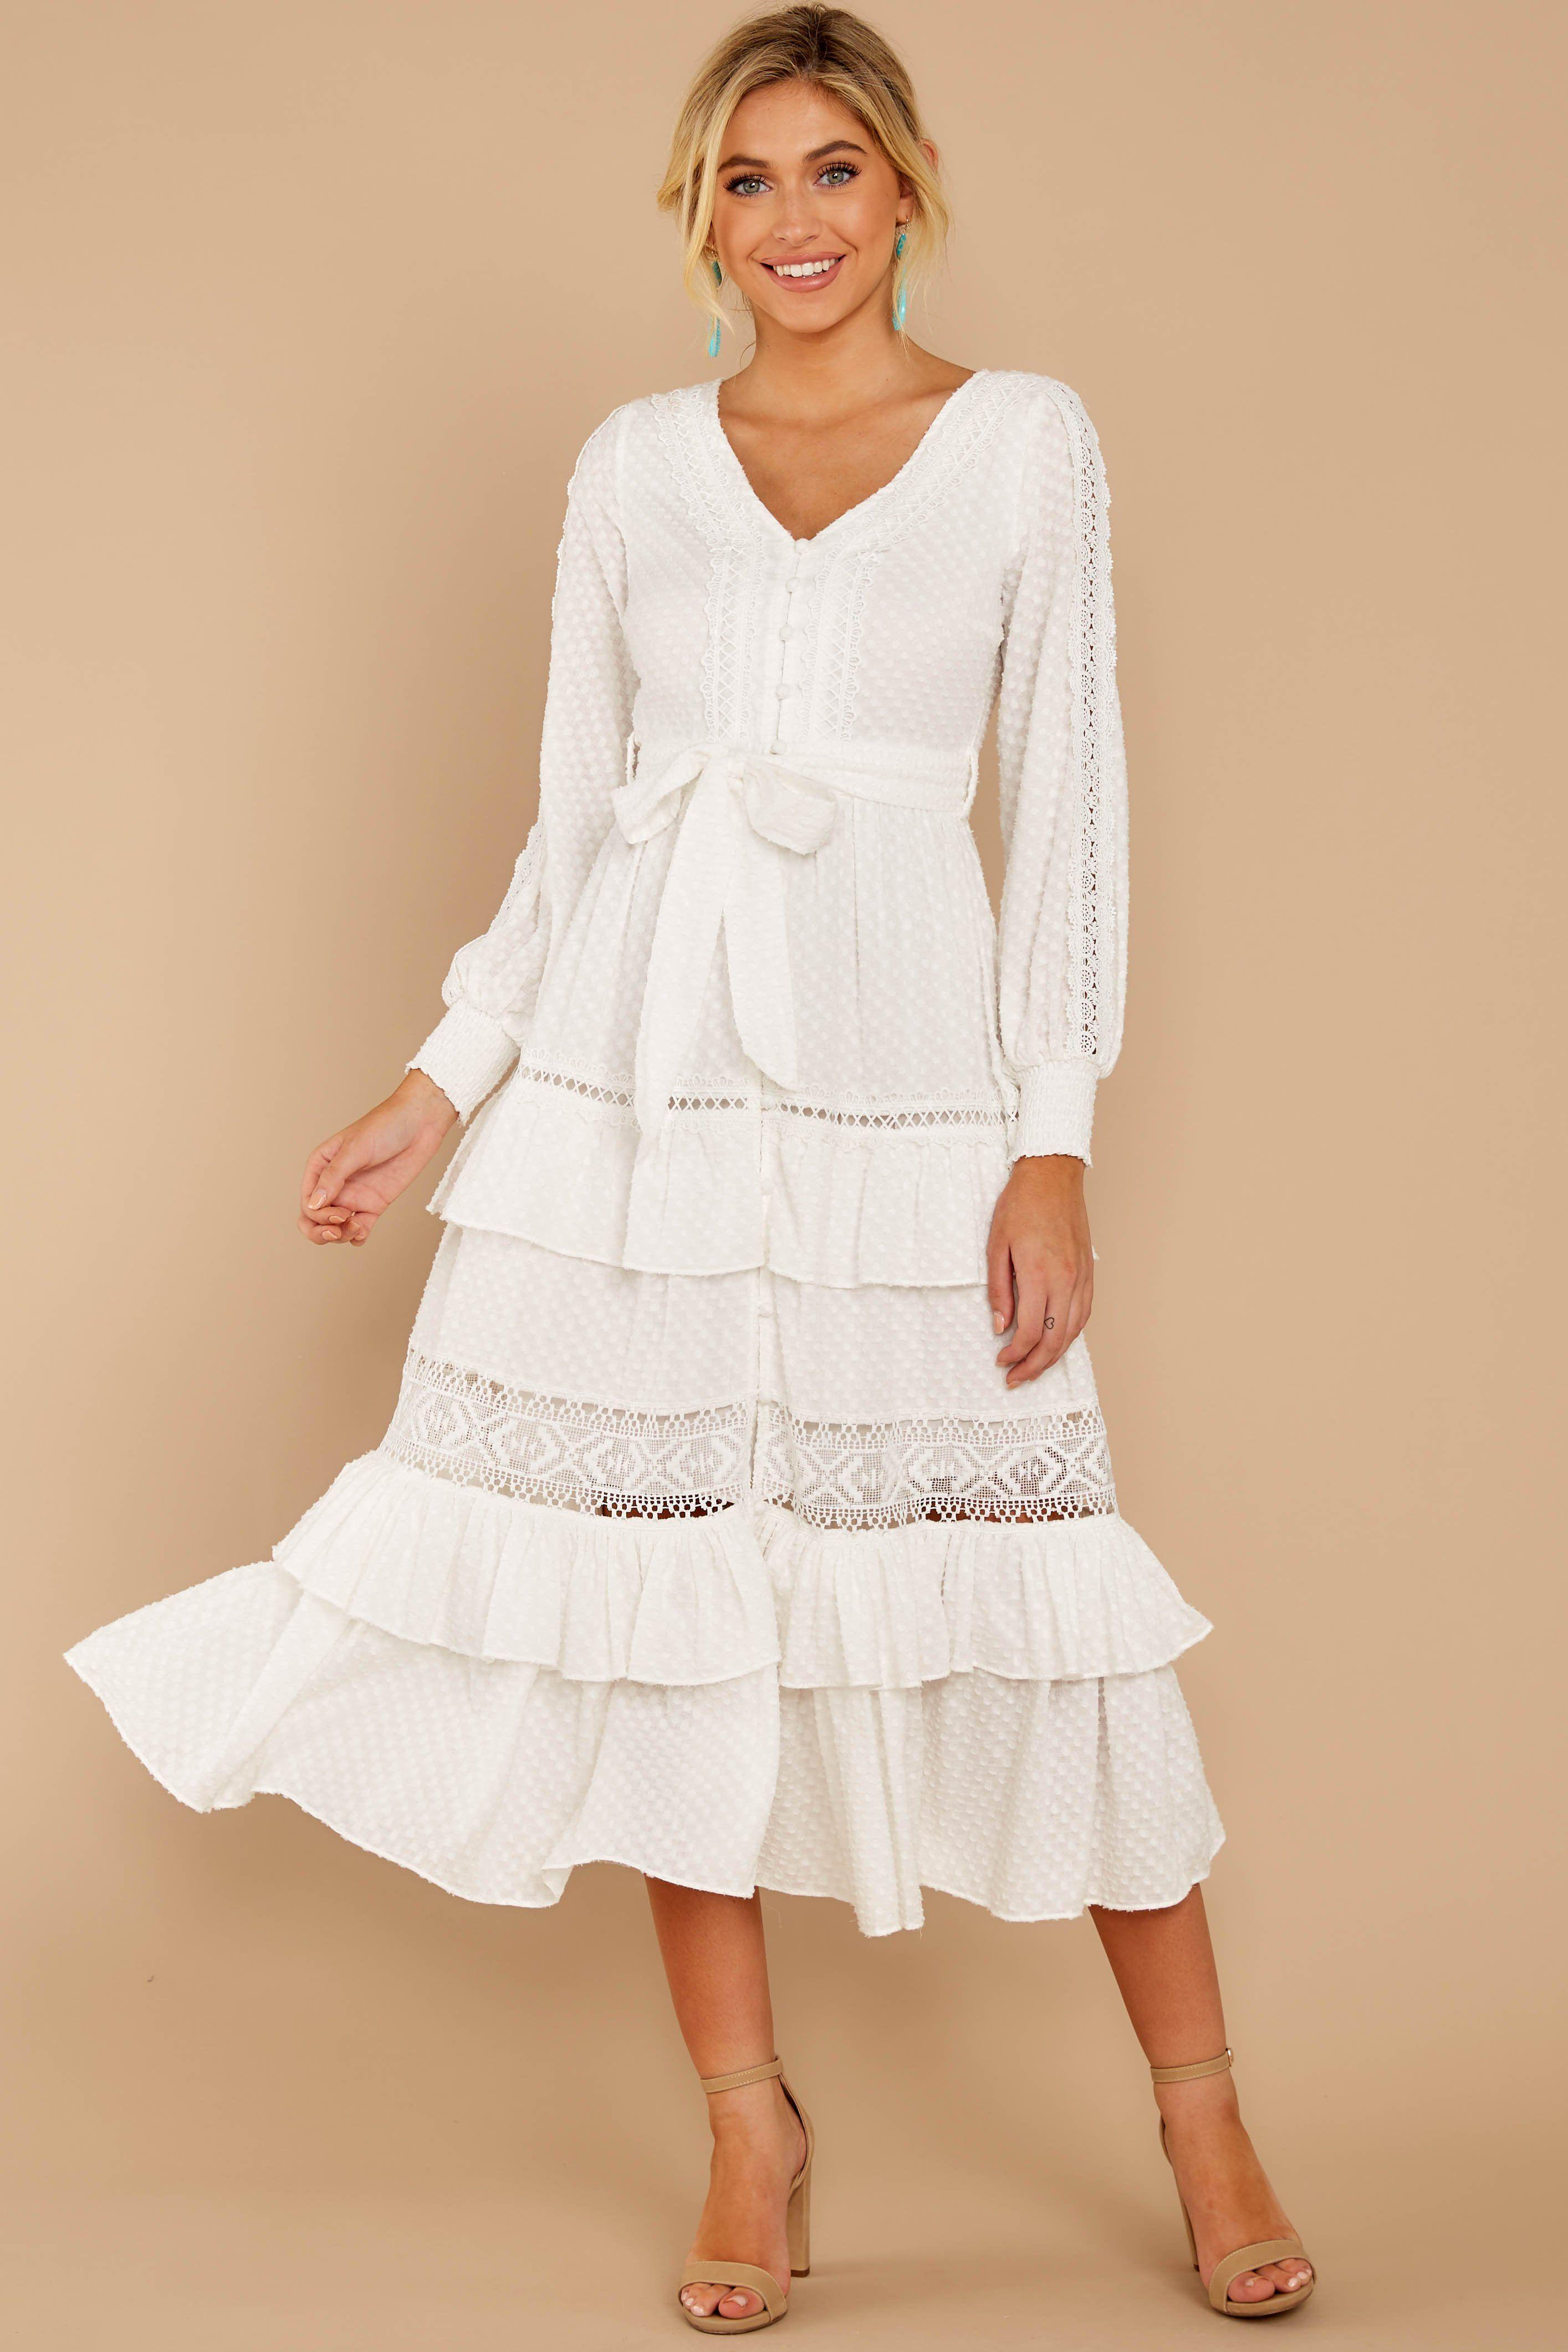 One Day Soon White Lace Midi Dress White Lace Maxi Dress Dresses White Lace Midi Dress [ 4243 x 2829 Pixel ]